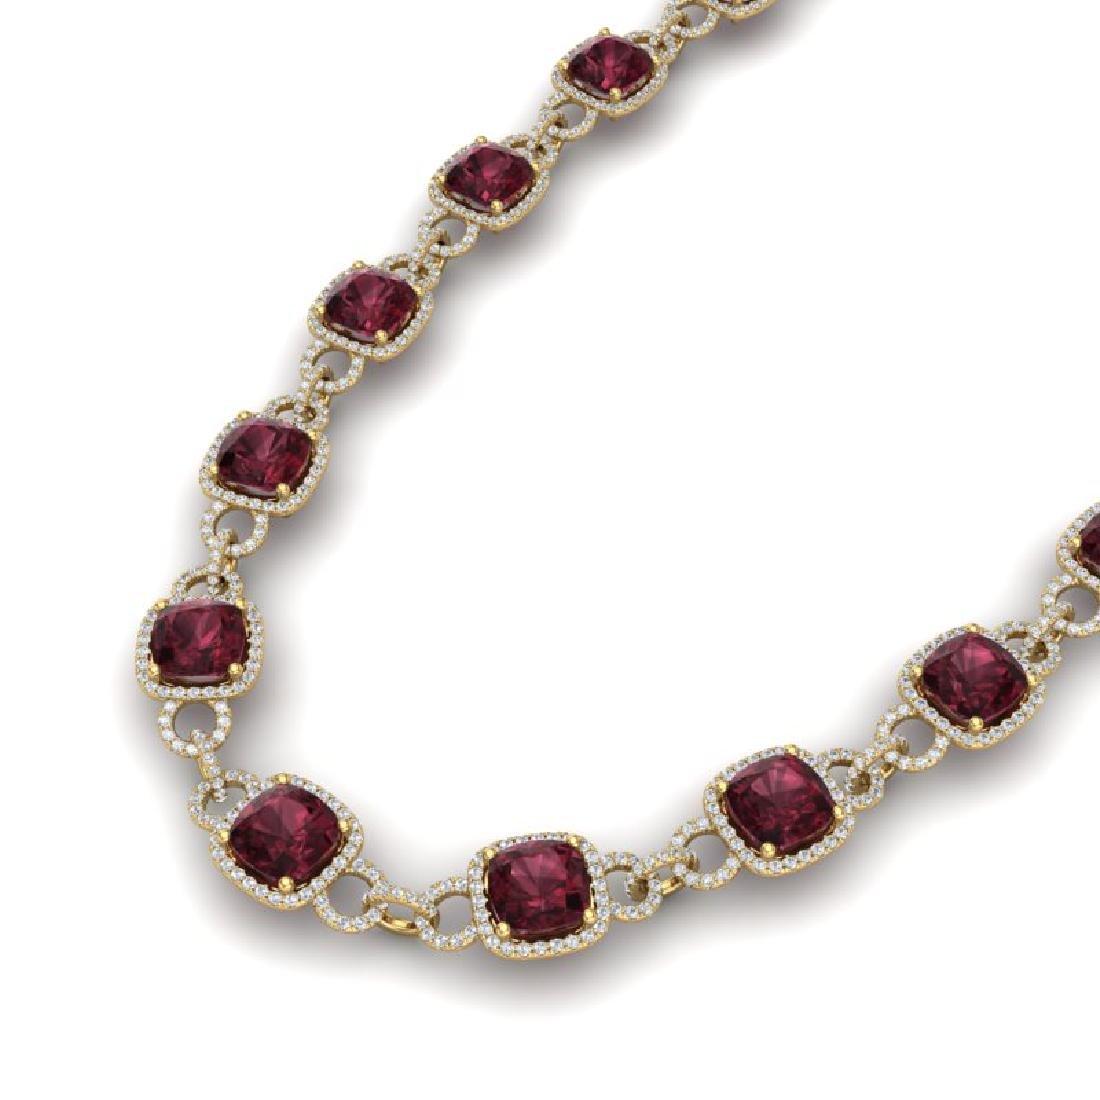 66 CTW Garnet & VS/SI Diamond Necklace 14K Yellow Gold